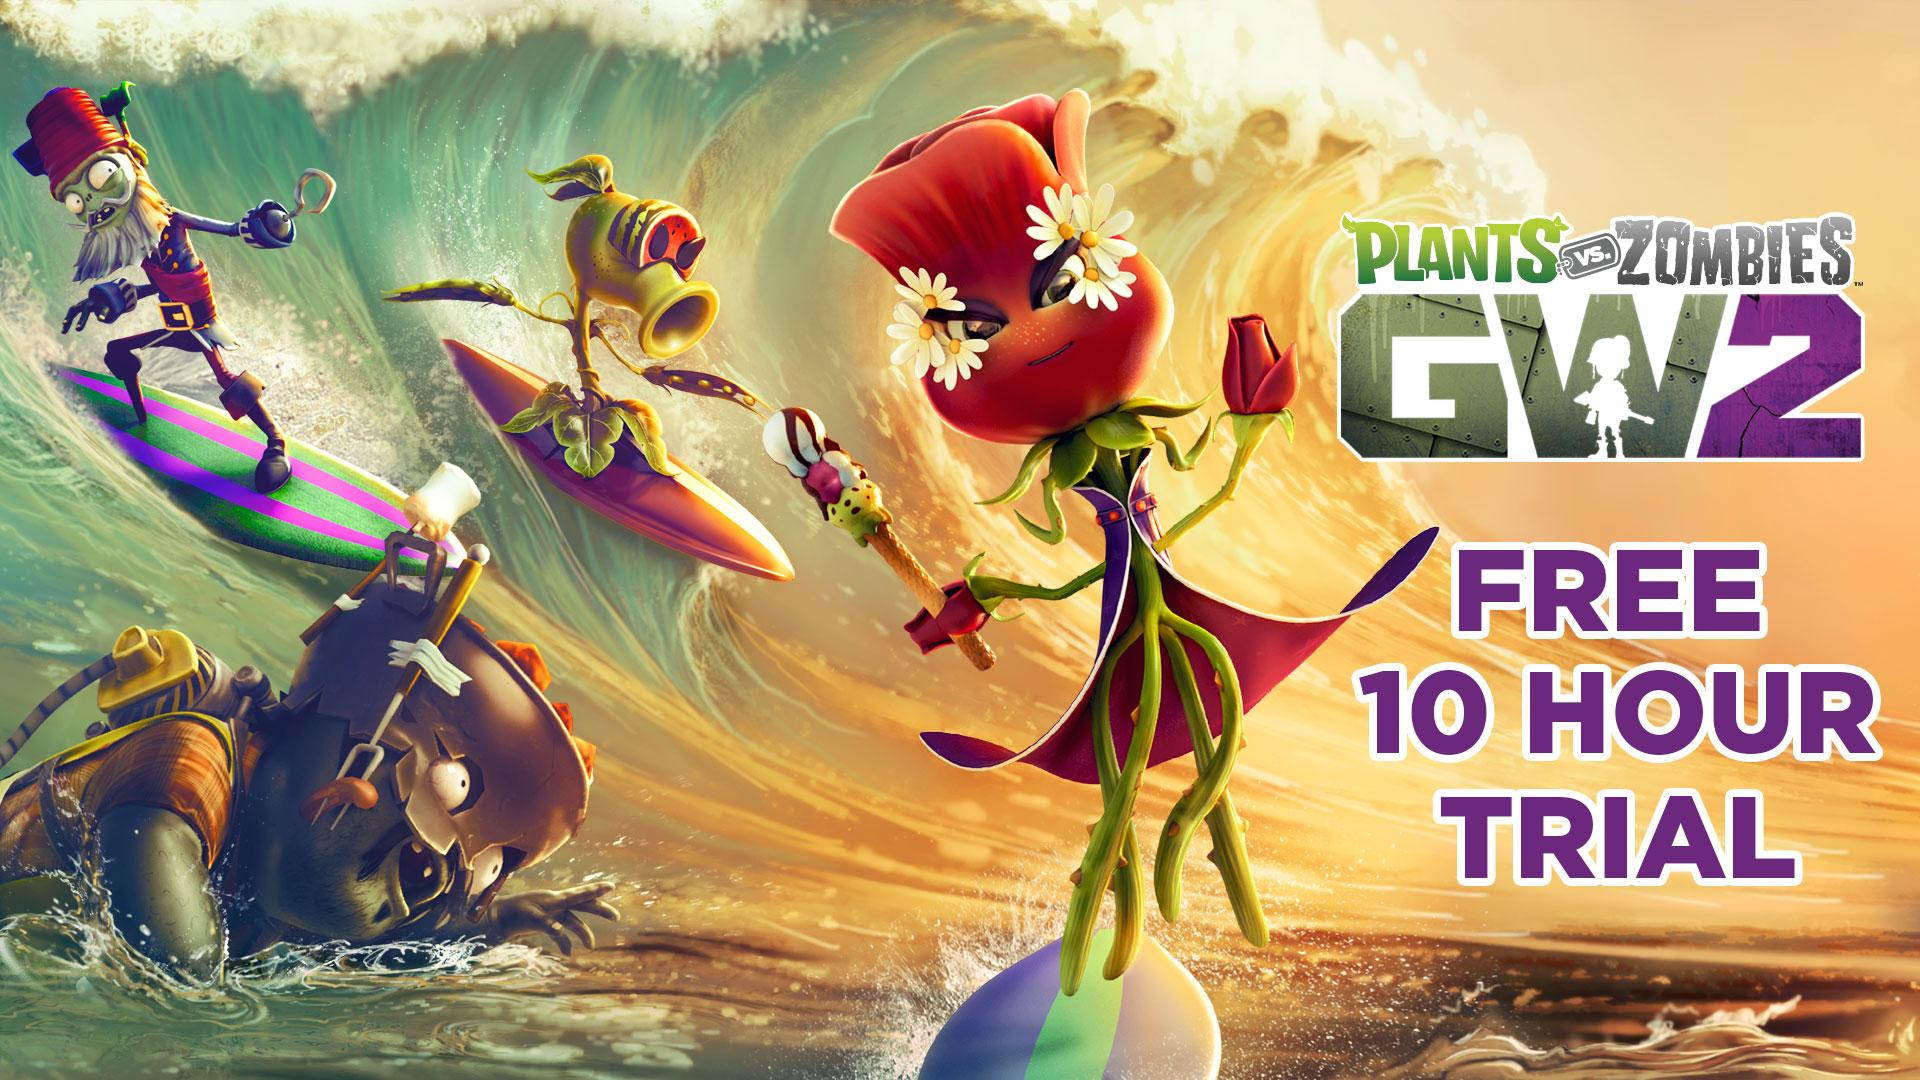 Plants vs Zombies Garden Warfare 2 comes to EA Access and Origin – Plants Vs Zombies Garden